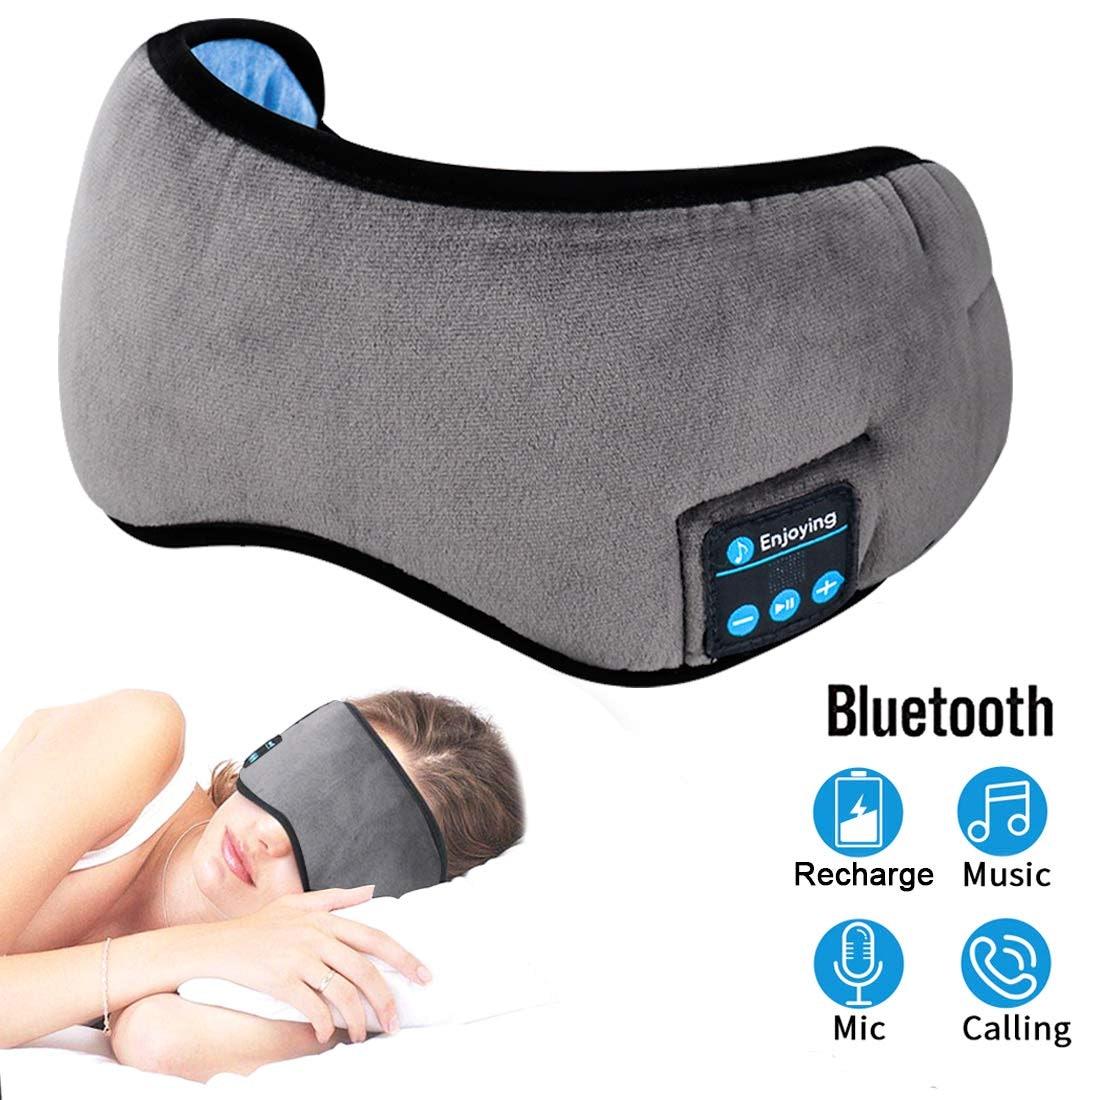 Bluetooth Eye Mask Sleep Headphones,ZesGood Music Travel Sleep Mask Wireless Bluetooth Headphones Built -in Speakers Microphone Handsfree Adjustable and Washable